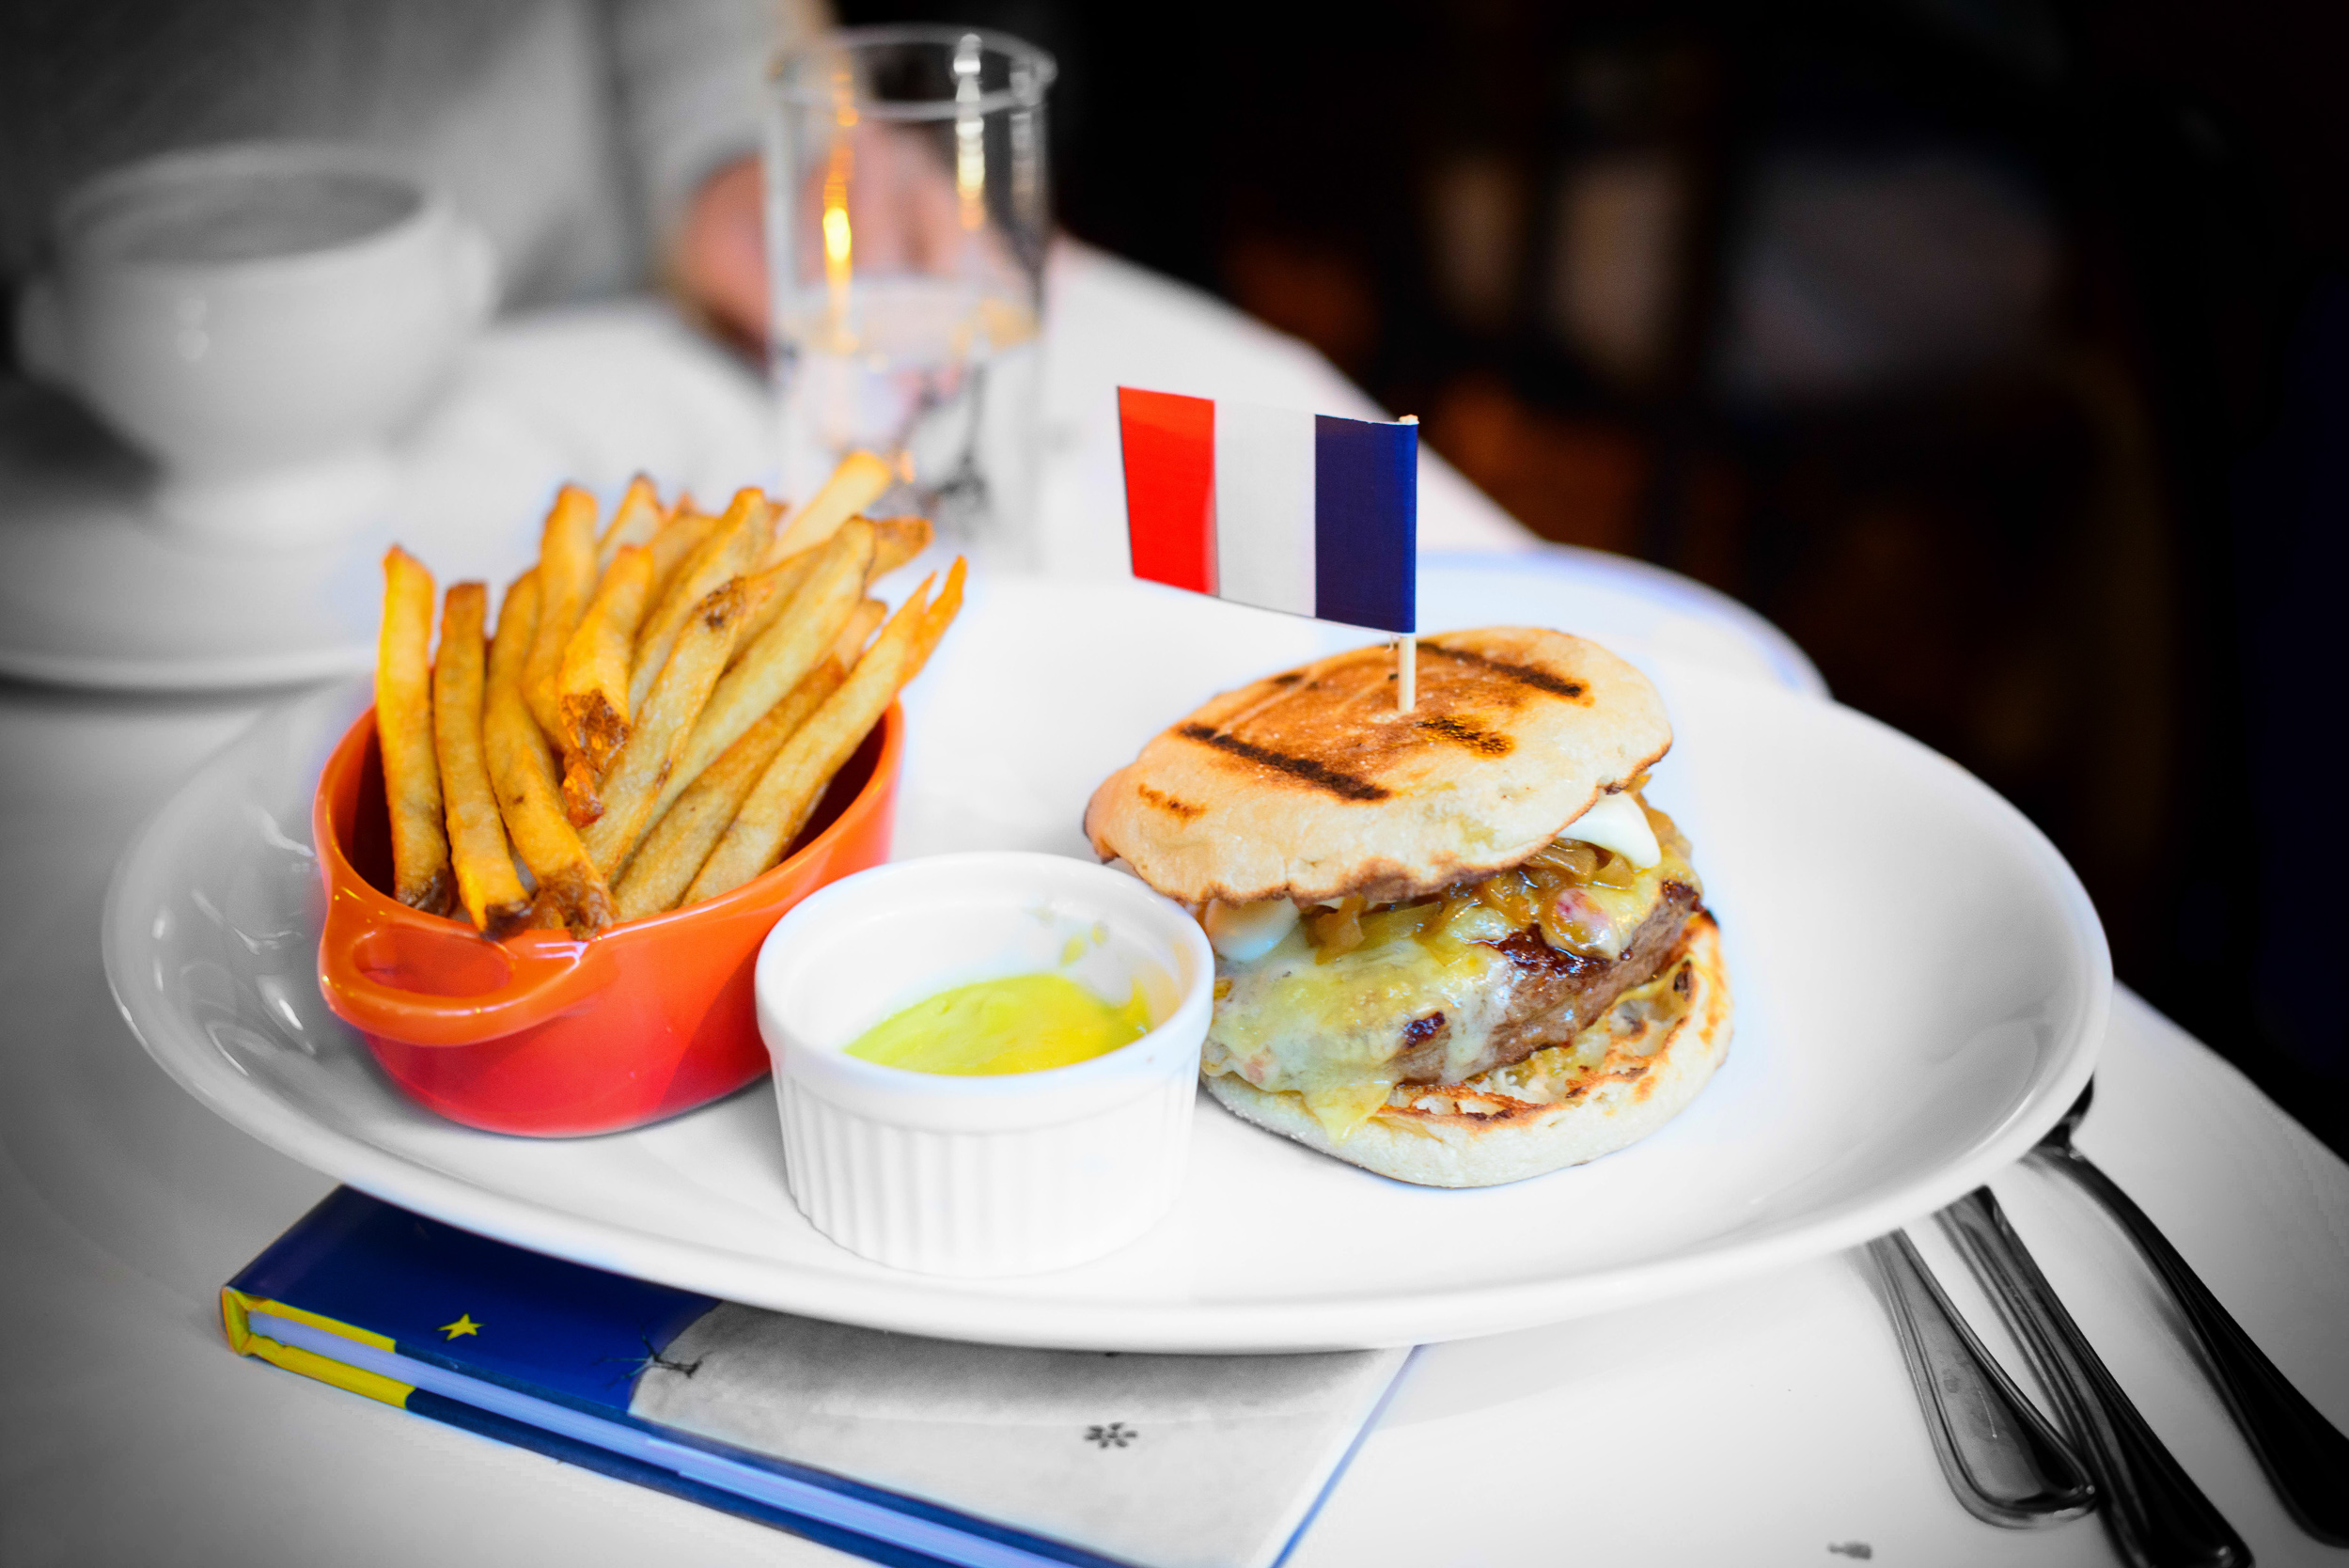 French onion soup burger - emmenthal, caramelized onion, dijon,